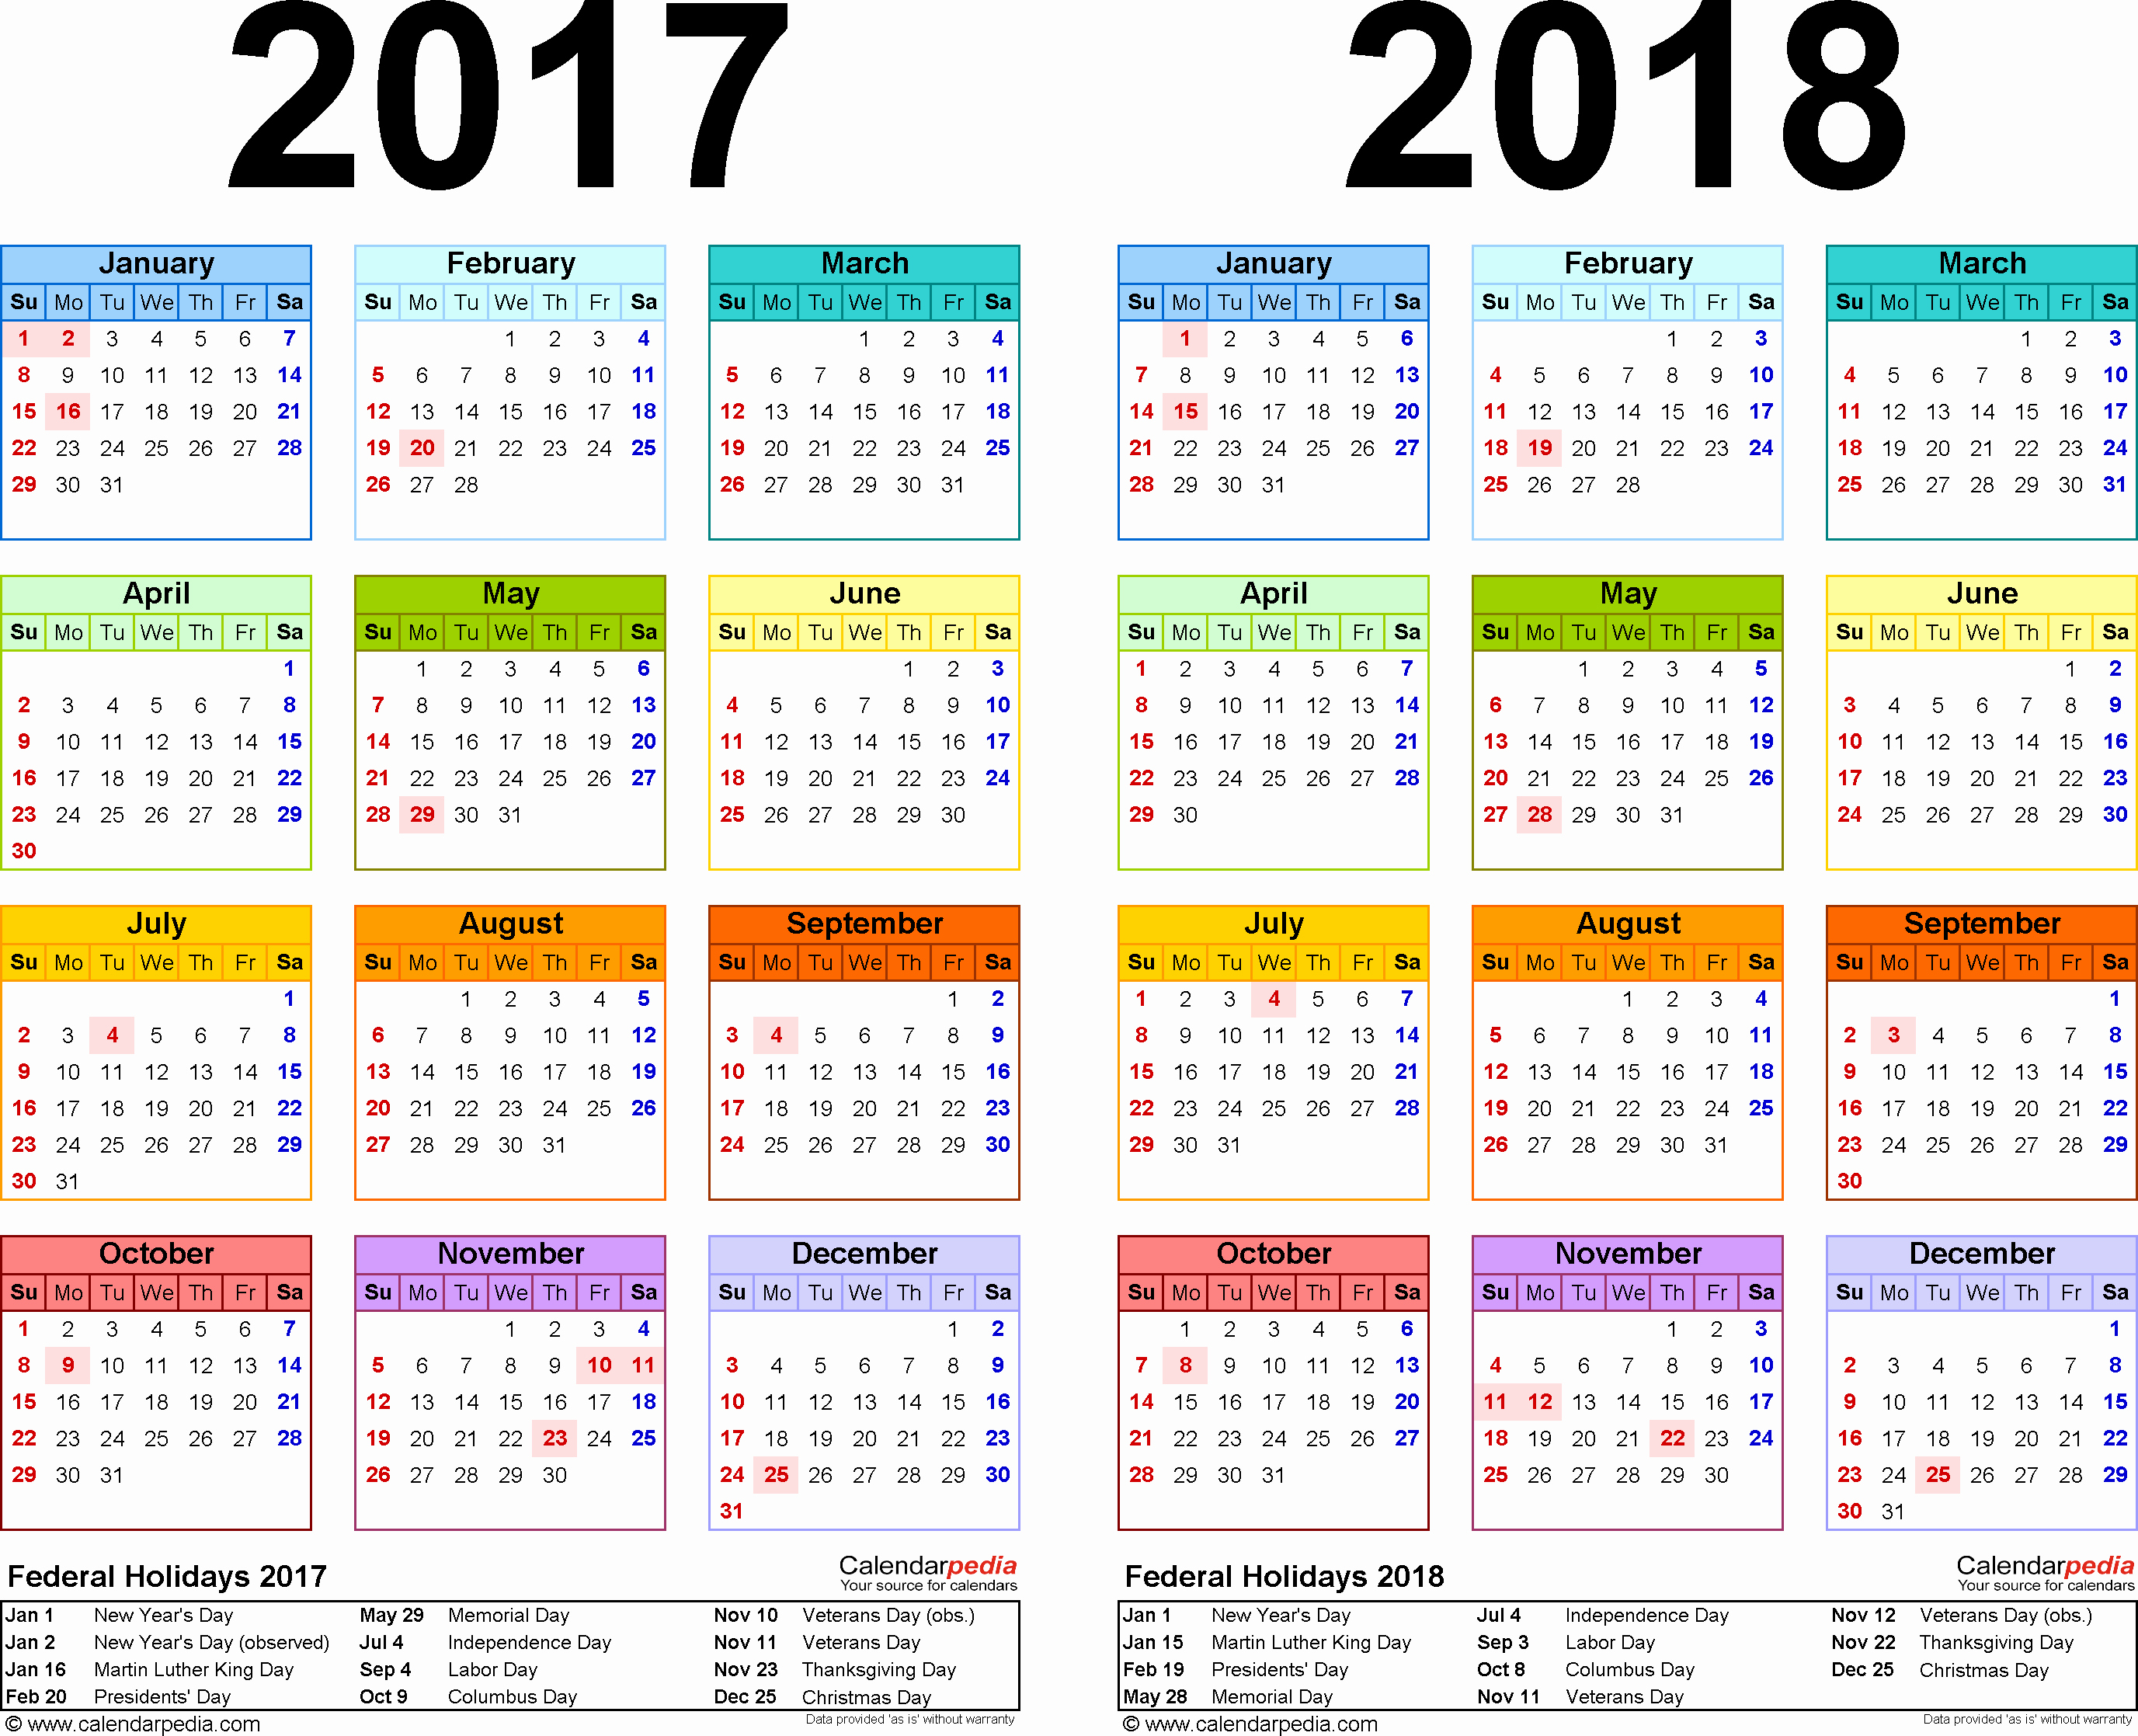 2017 Weekly Calendar with Holidays Fresh 2018 Calendar Holidays